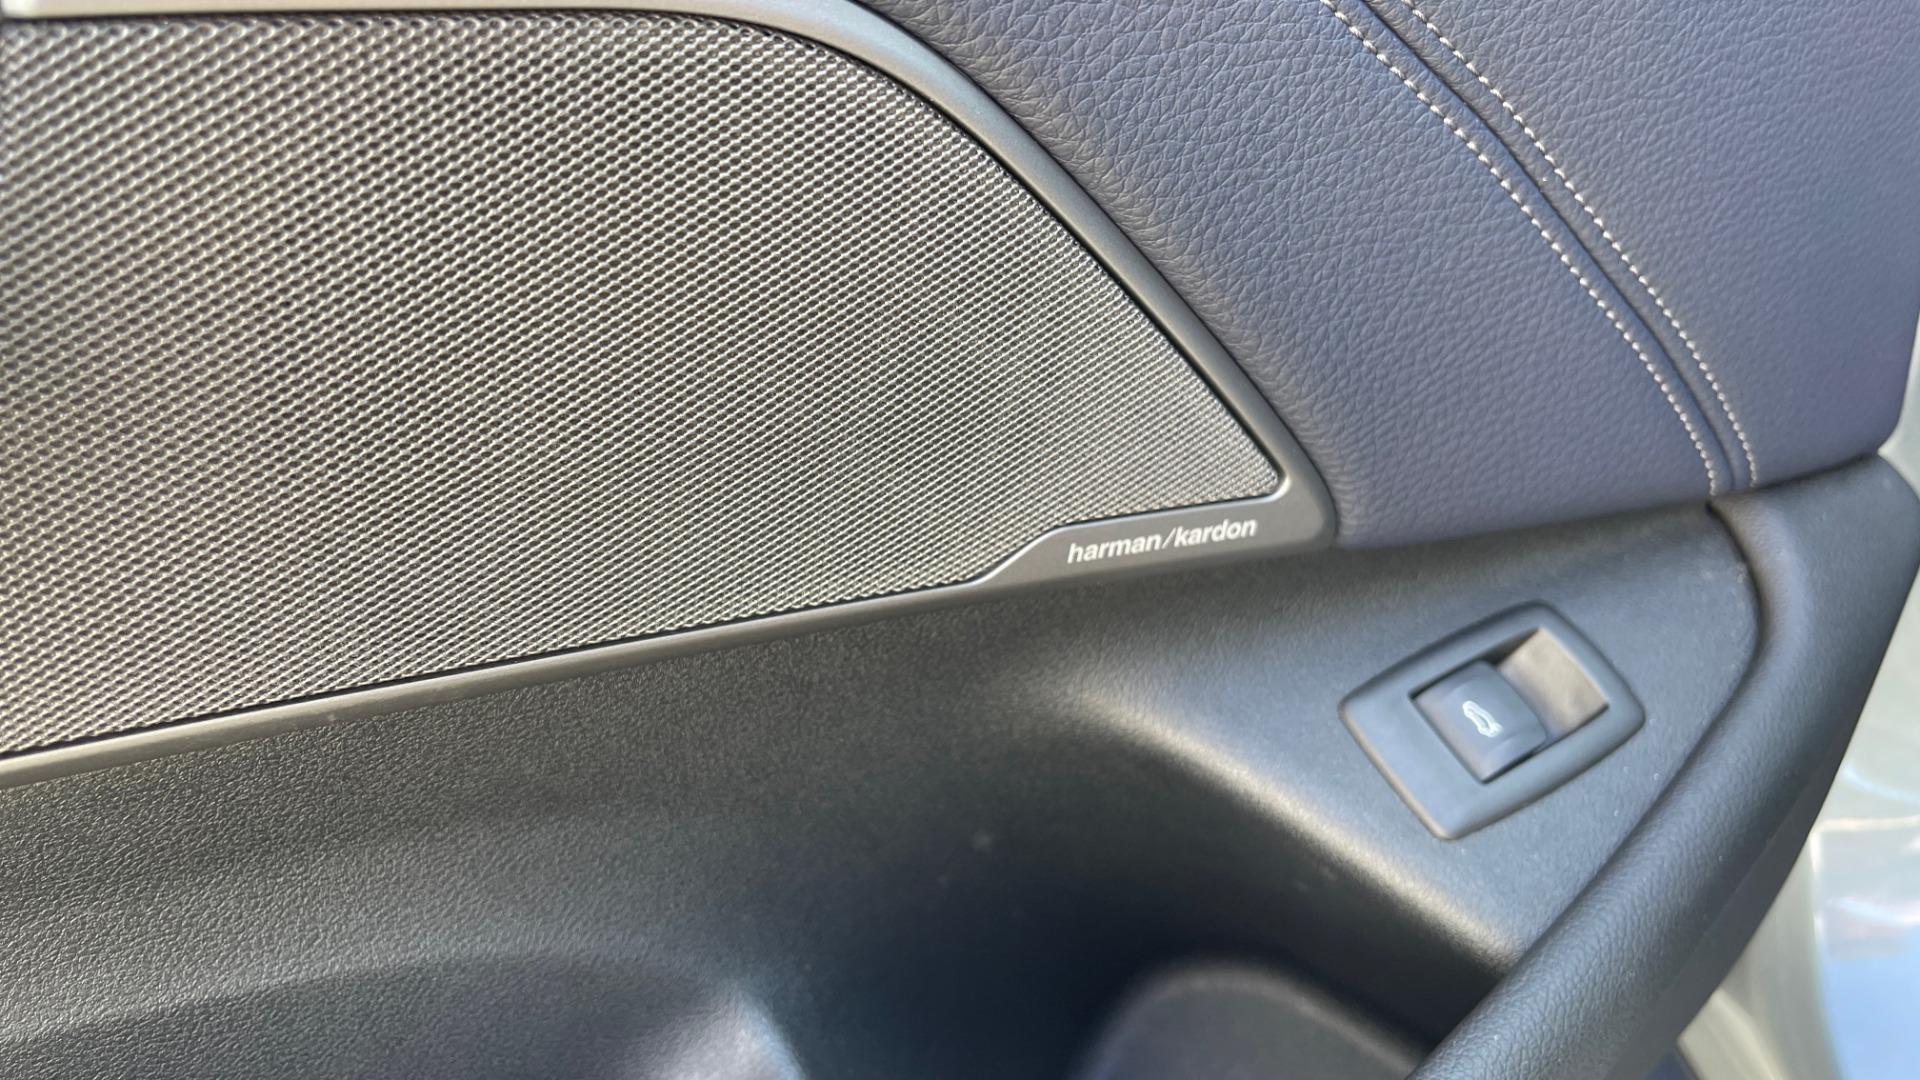 Used 2018 BMW 5 SERIES 540I XDRIVE M-SPORT / DRVR ASST / PDC / APPLE / HUD / H/K SND for sale $42,795 at Formula Imports in Charlotte NC 28227 27